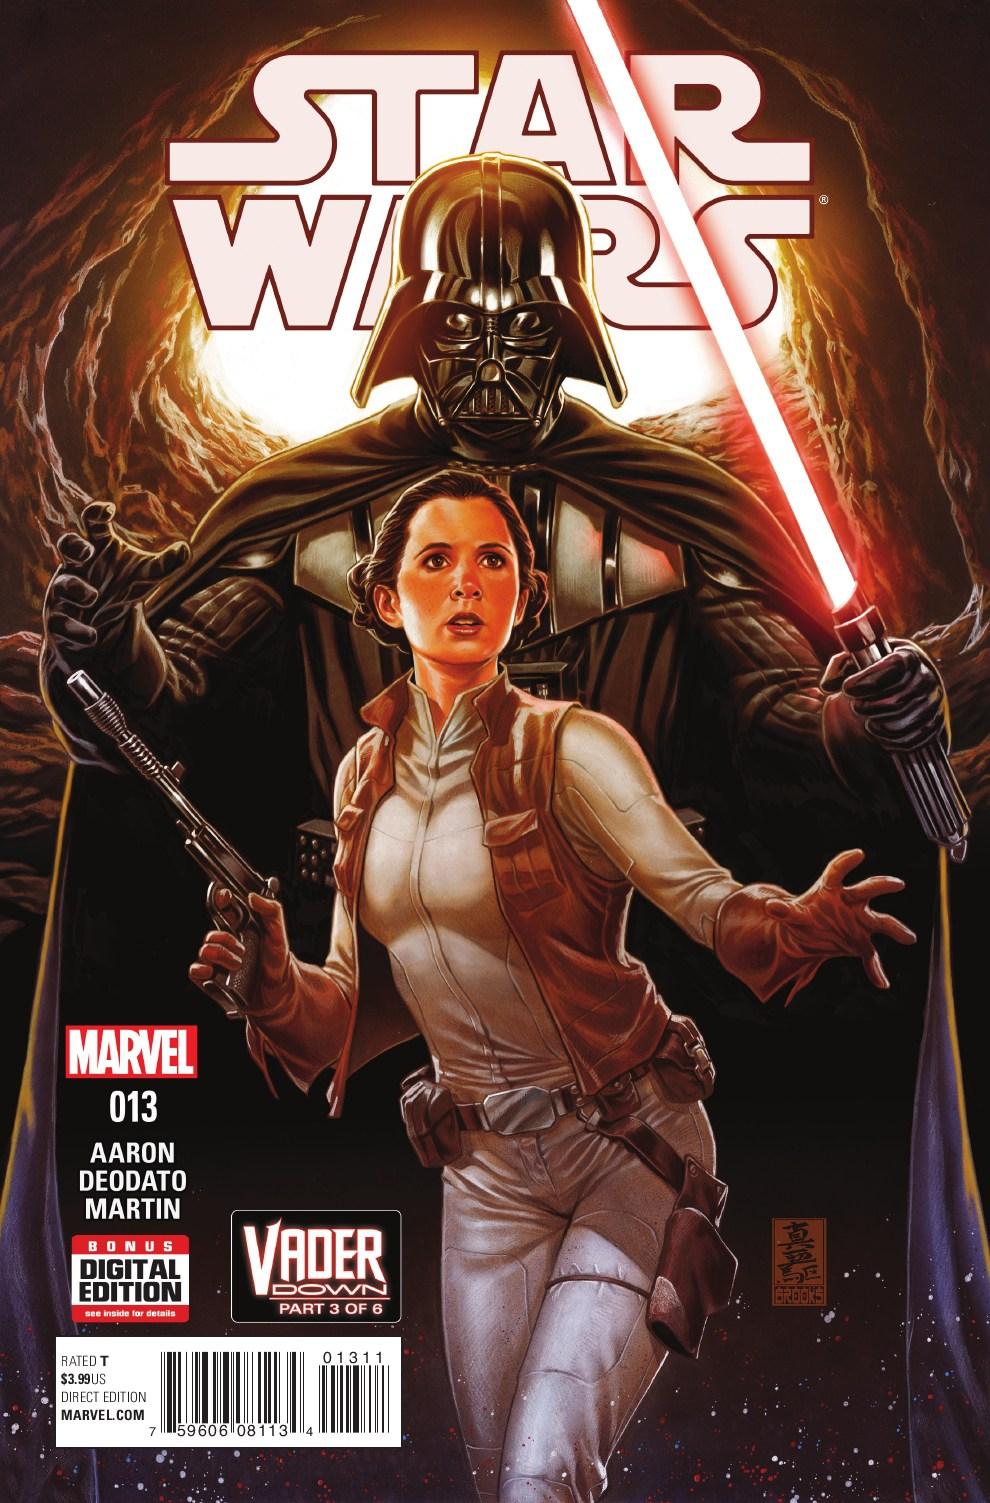 Star Wars #13: Vader Down, Part 3 (02.12.2015)